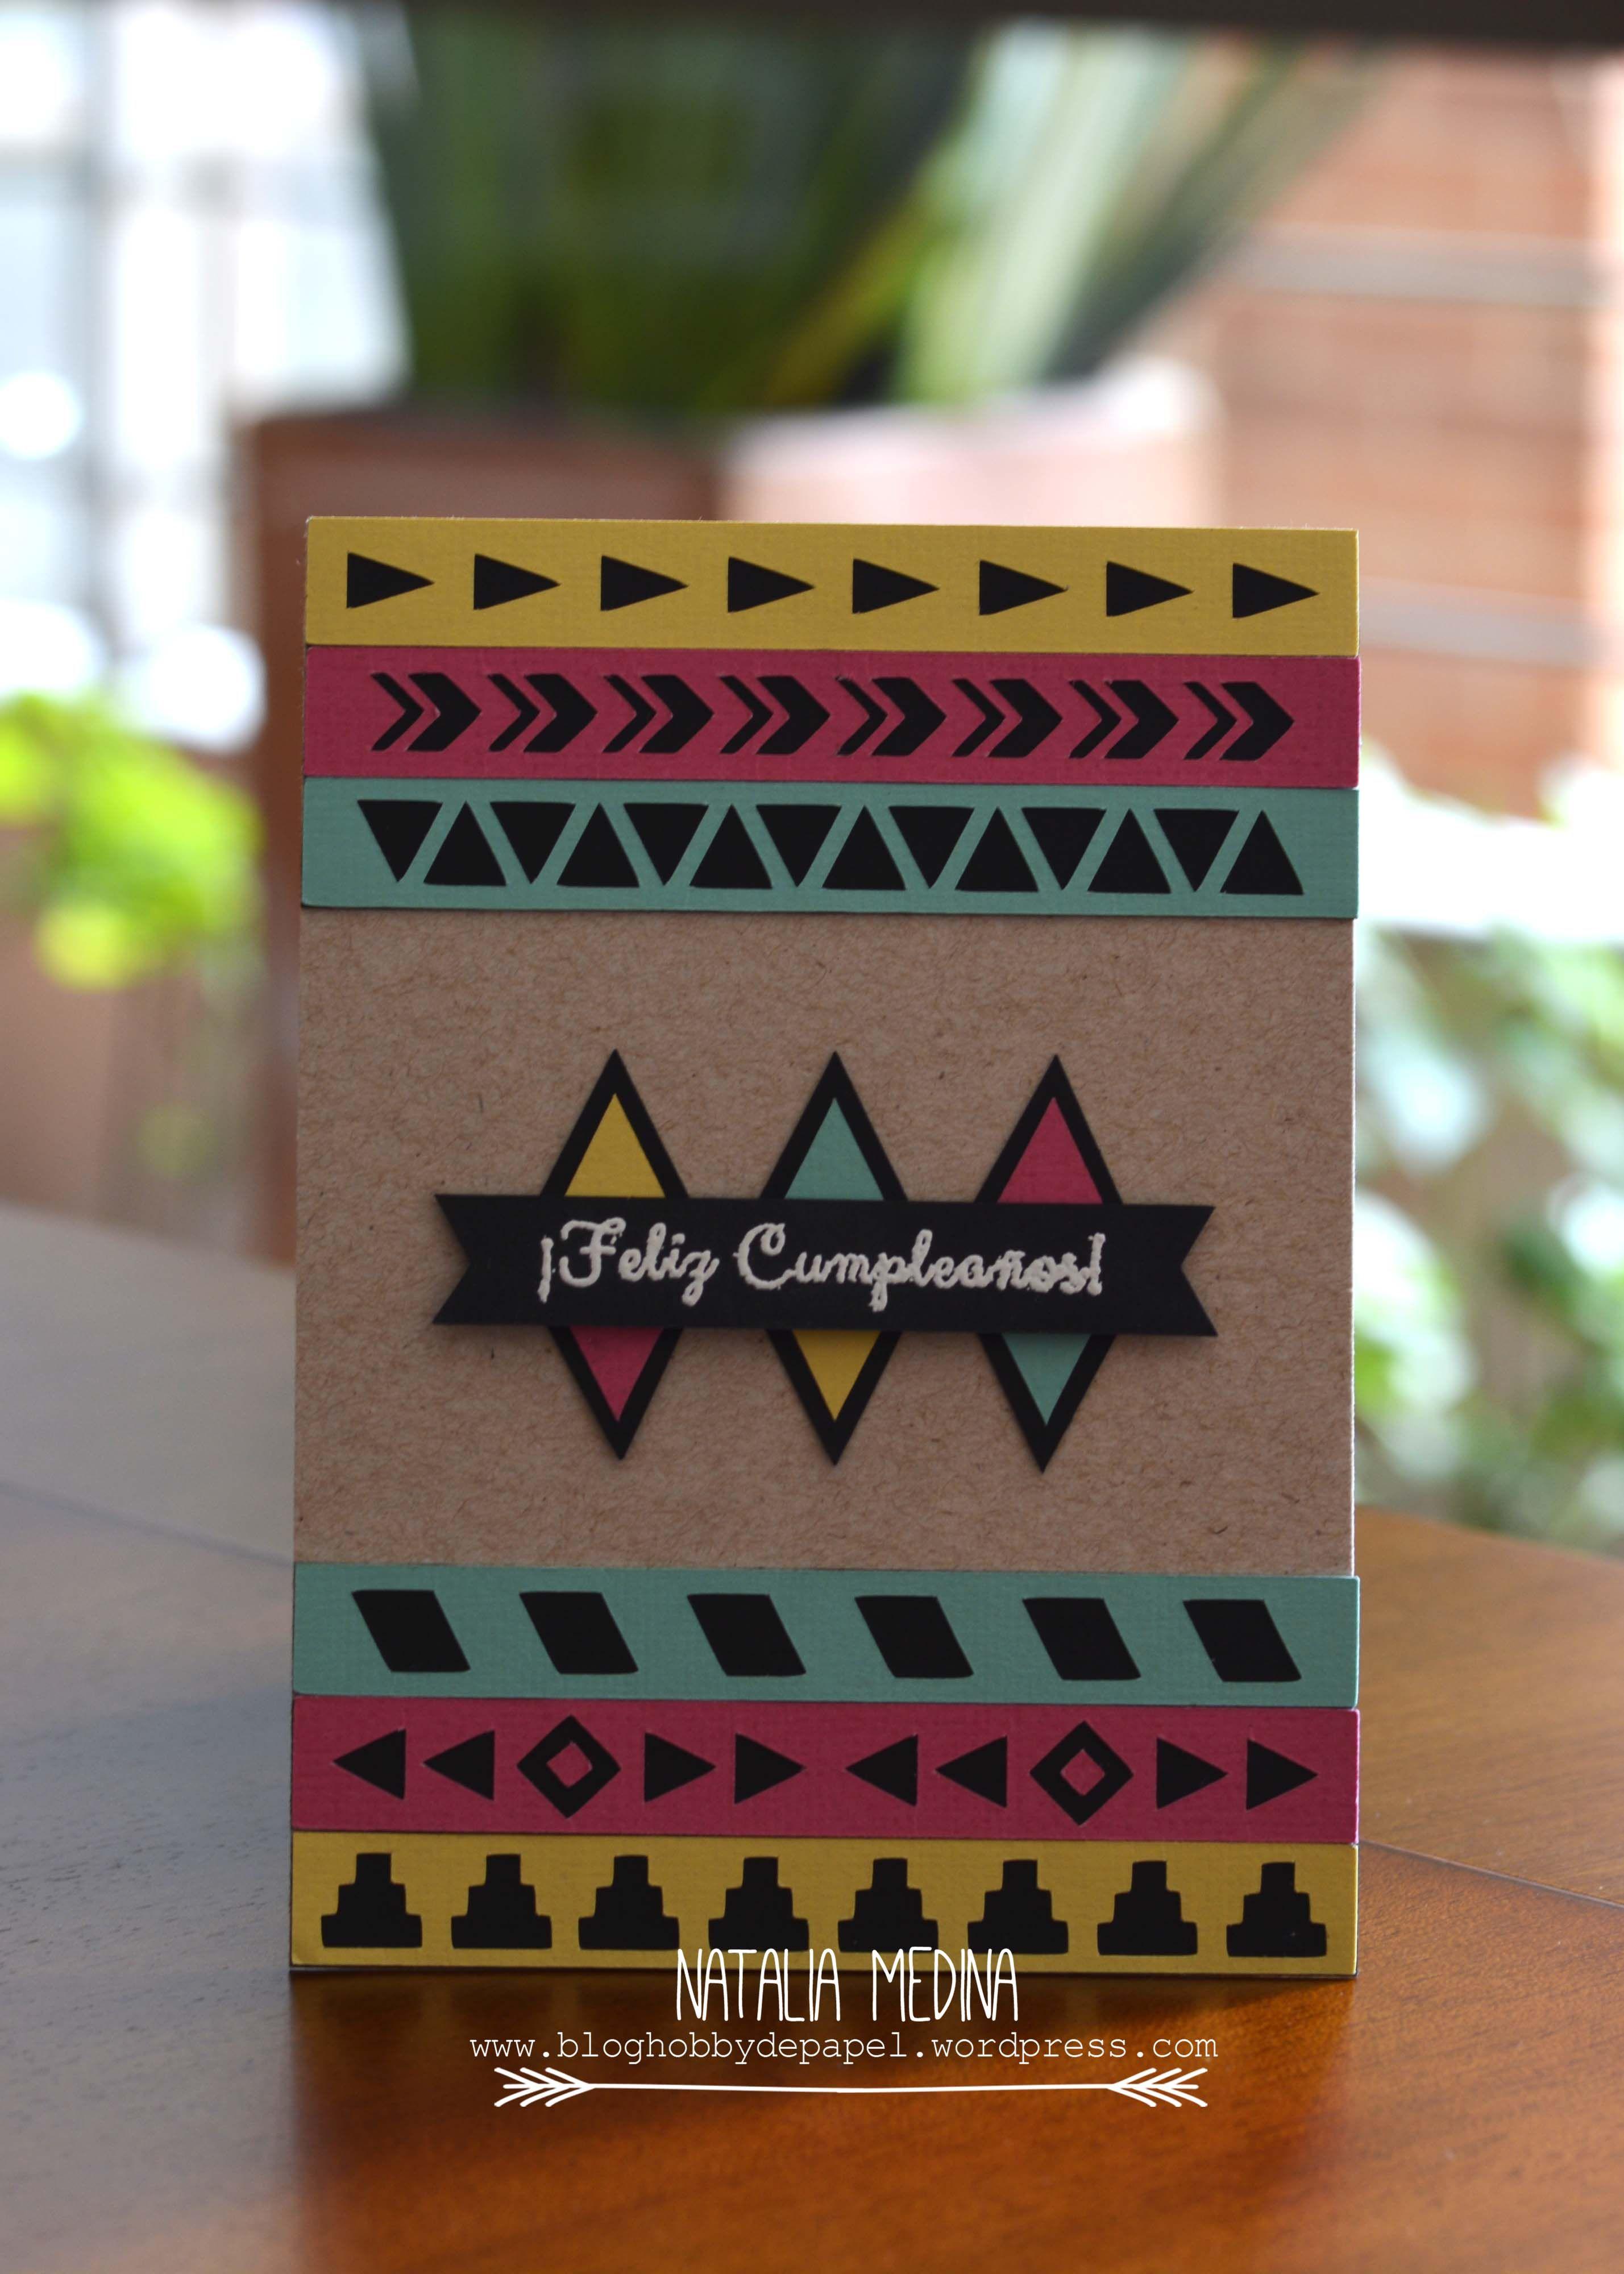 Tarjeta tribal de cumpleaños NOTES Tarjetas de cumpleaños amiga, Cartas de cumpleaños y